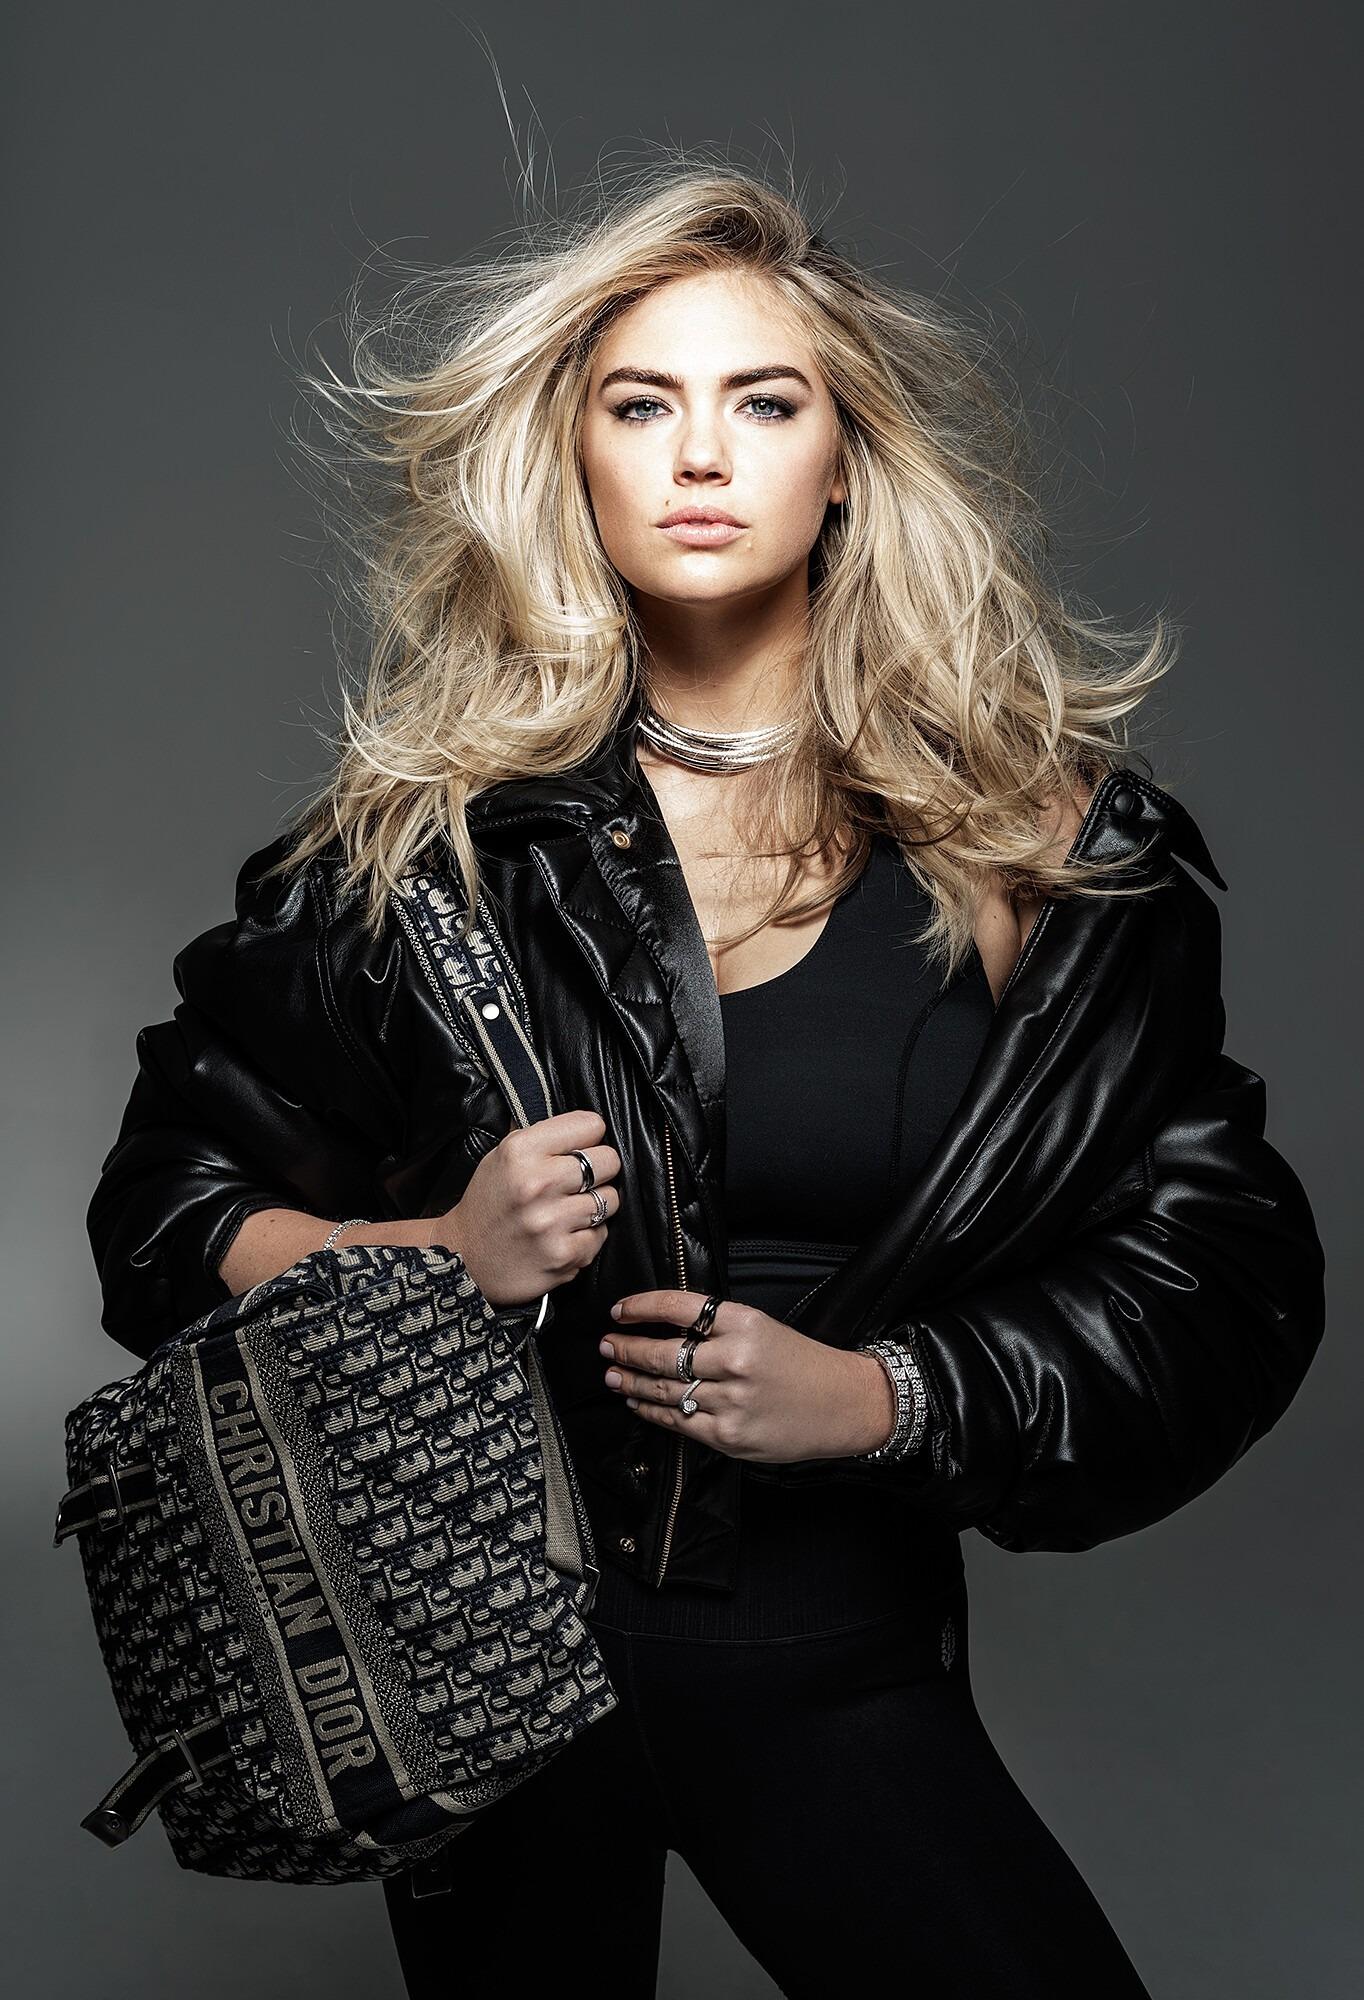 Kate Upton Fashion Style DP